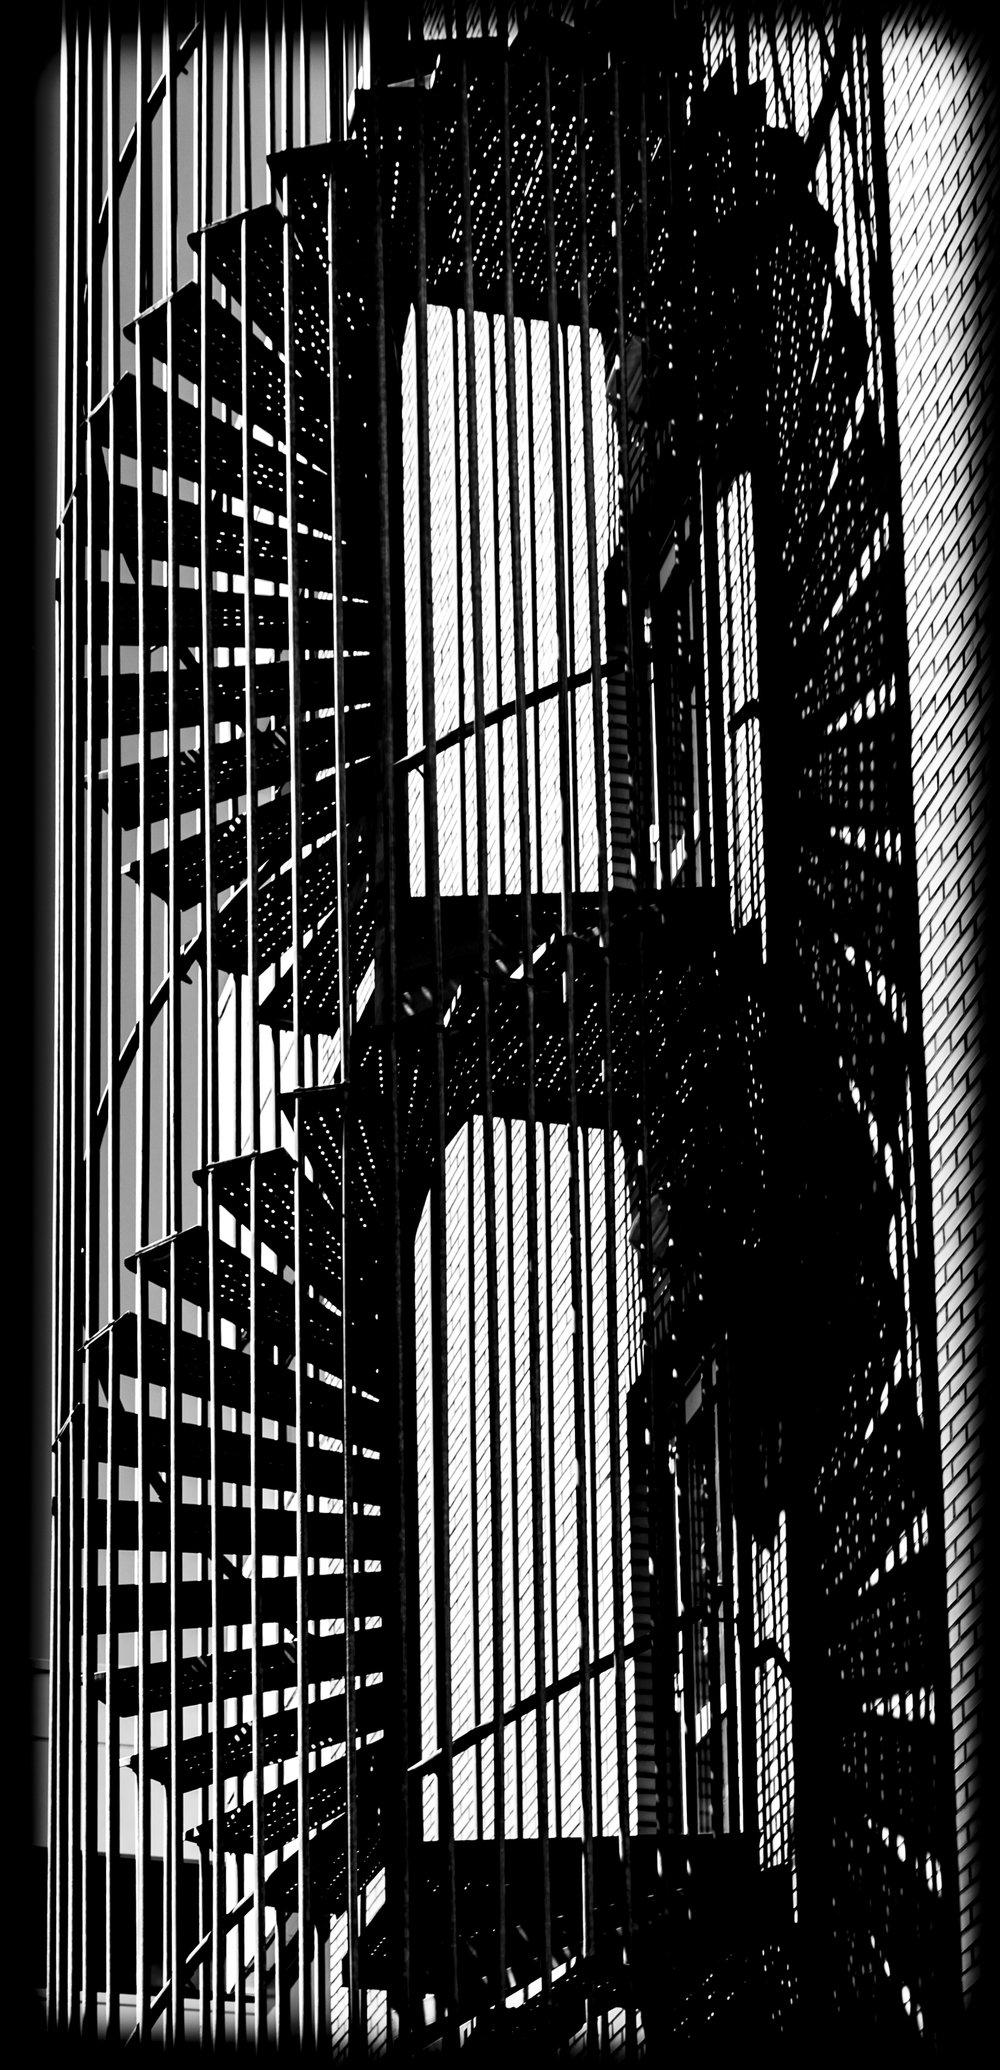 Bart Vos_Stairs6.jpg